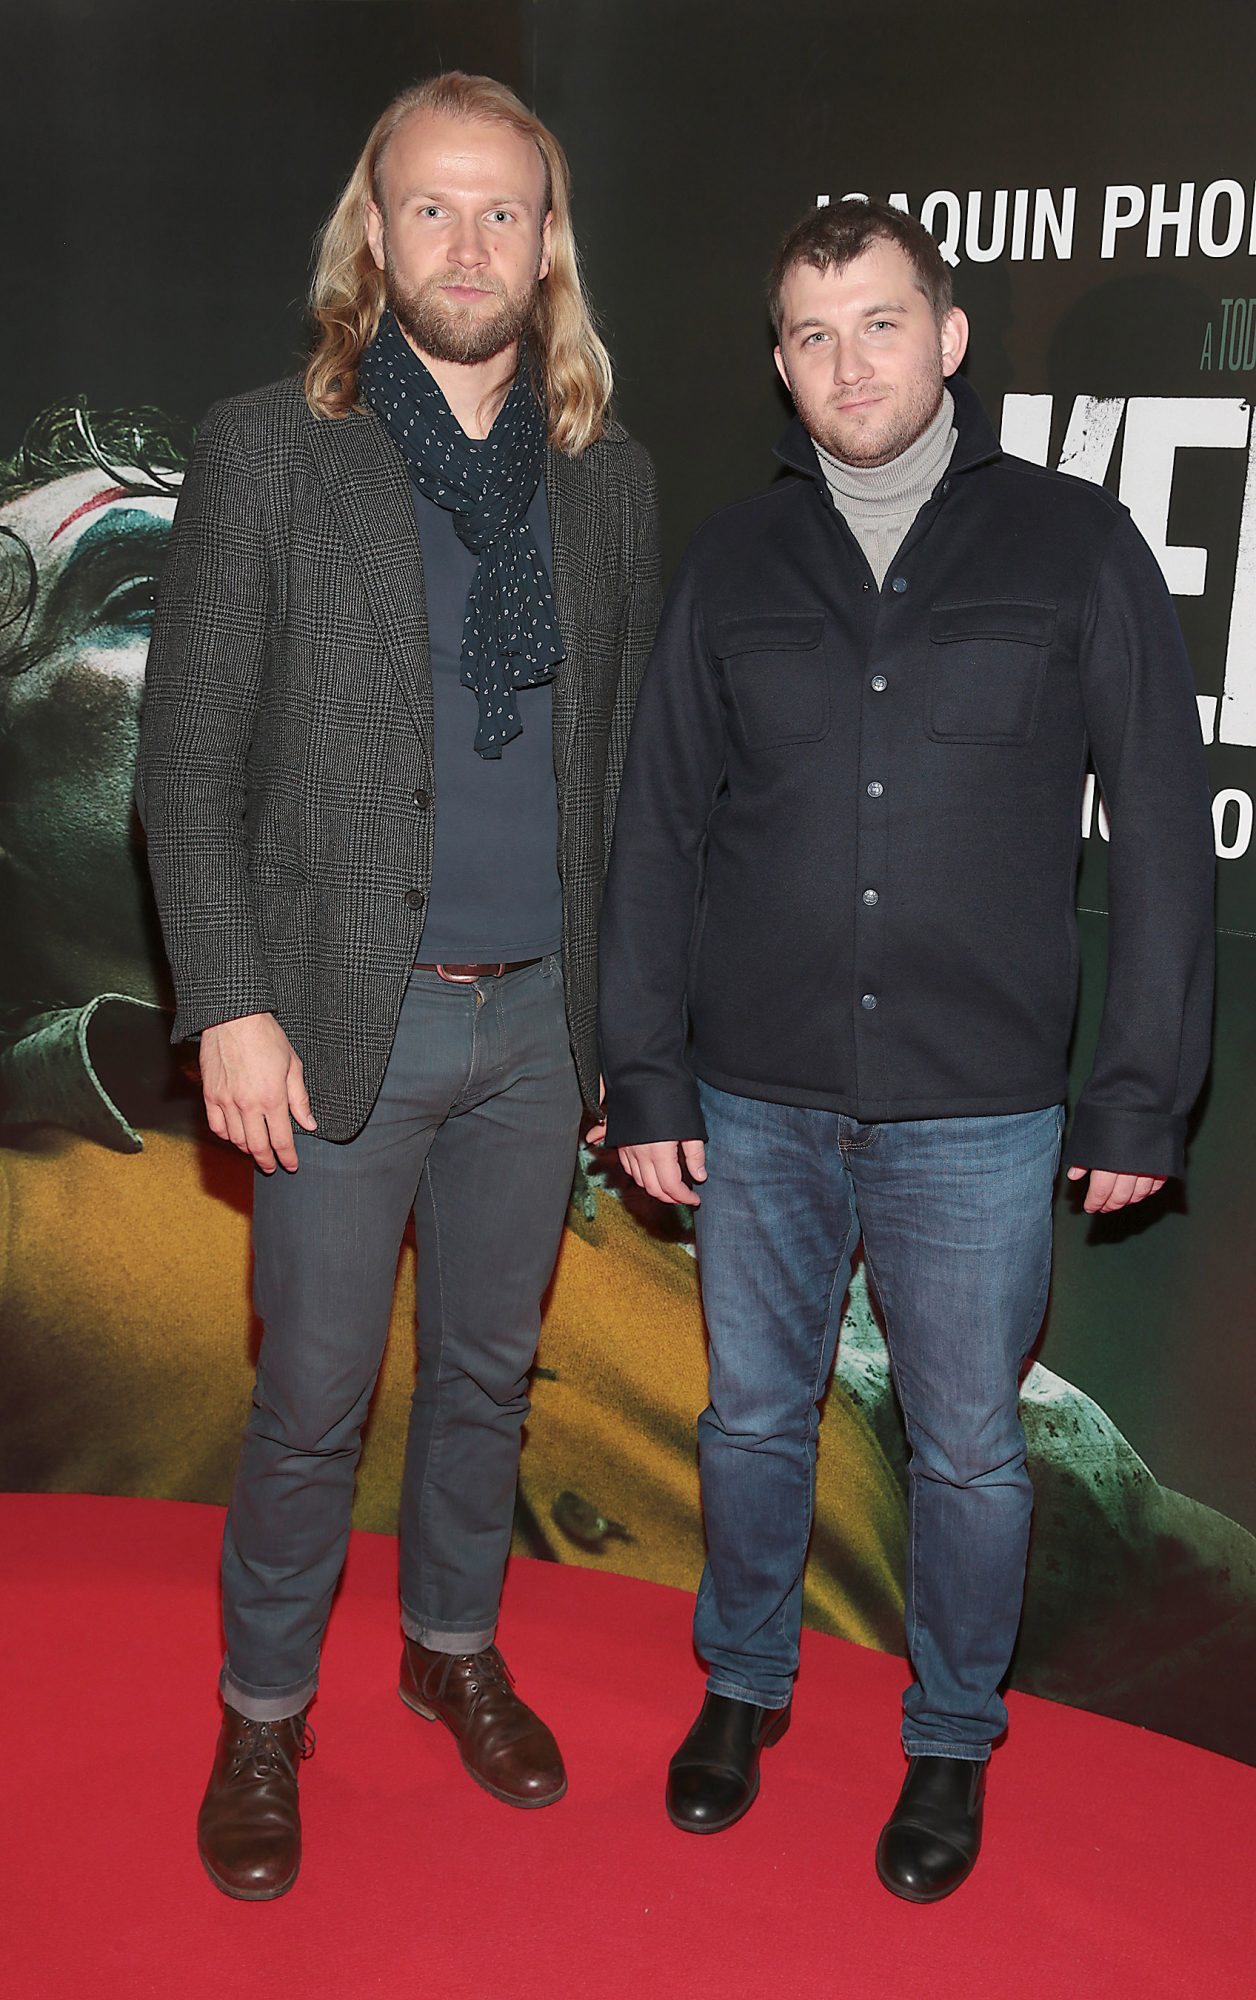 Dimitry Vinokurov and Viatcheslav Mamaev at the Irish Premiere screening of Joker at Cineworld, Dublin. Pic: Brian McEvoy.